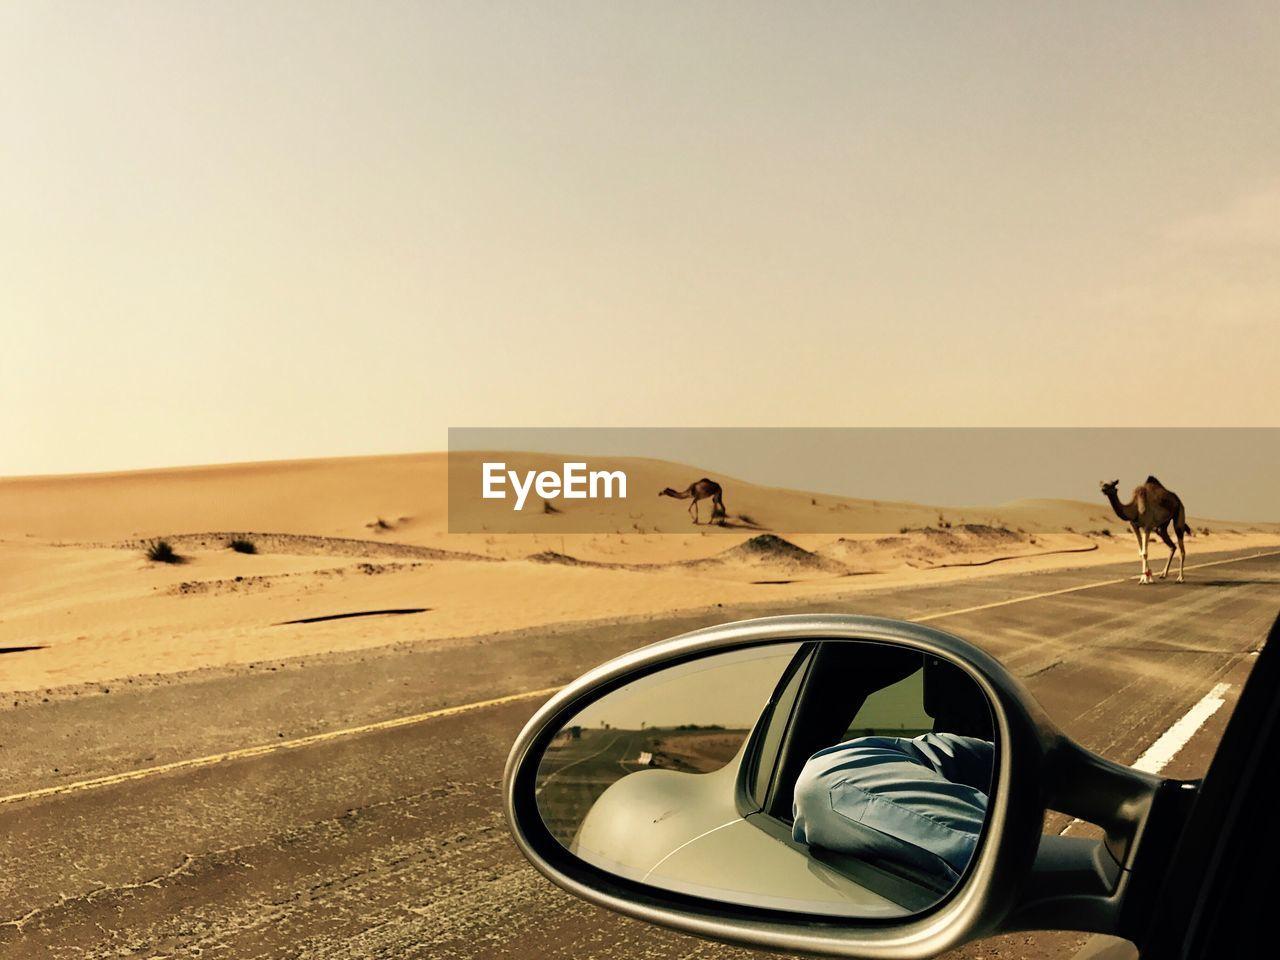 Car in desert against clear sky